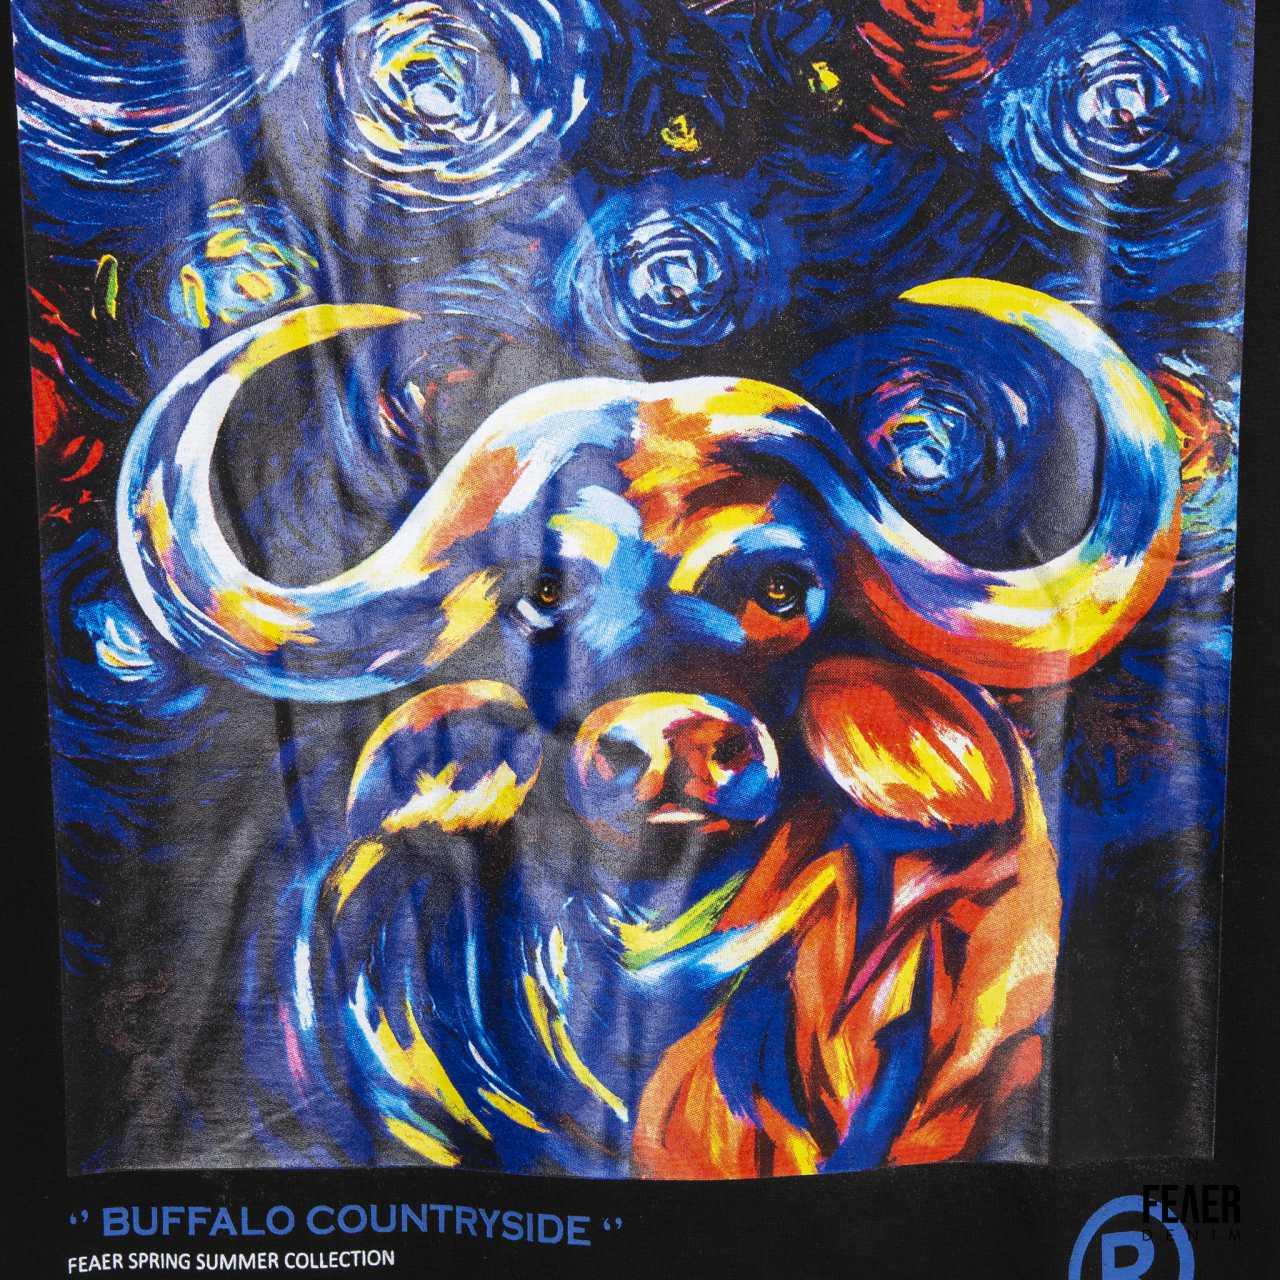 SP308 - Áo Thun Buffalo Culture